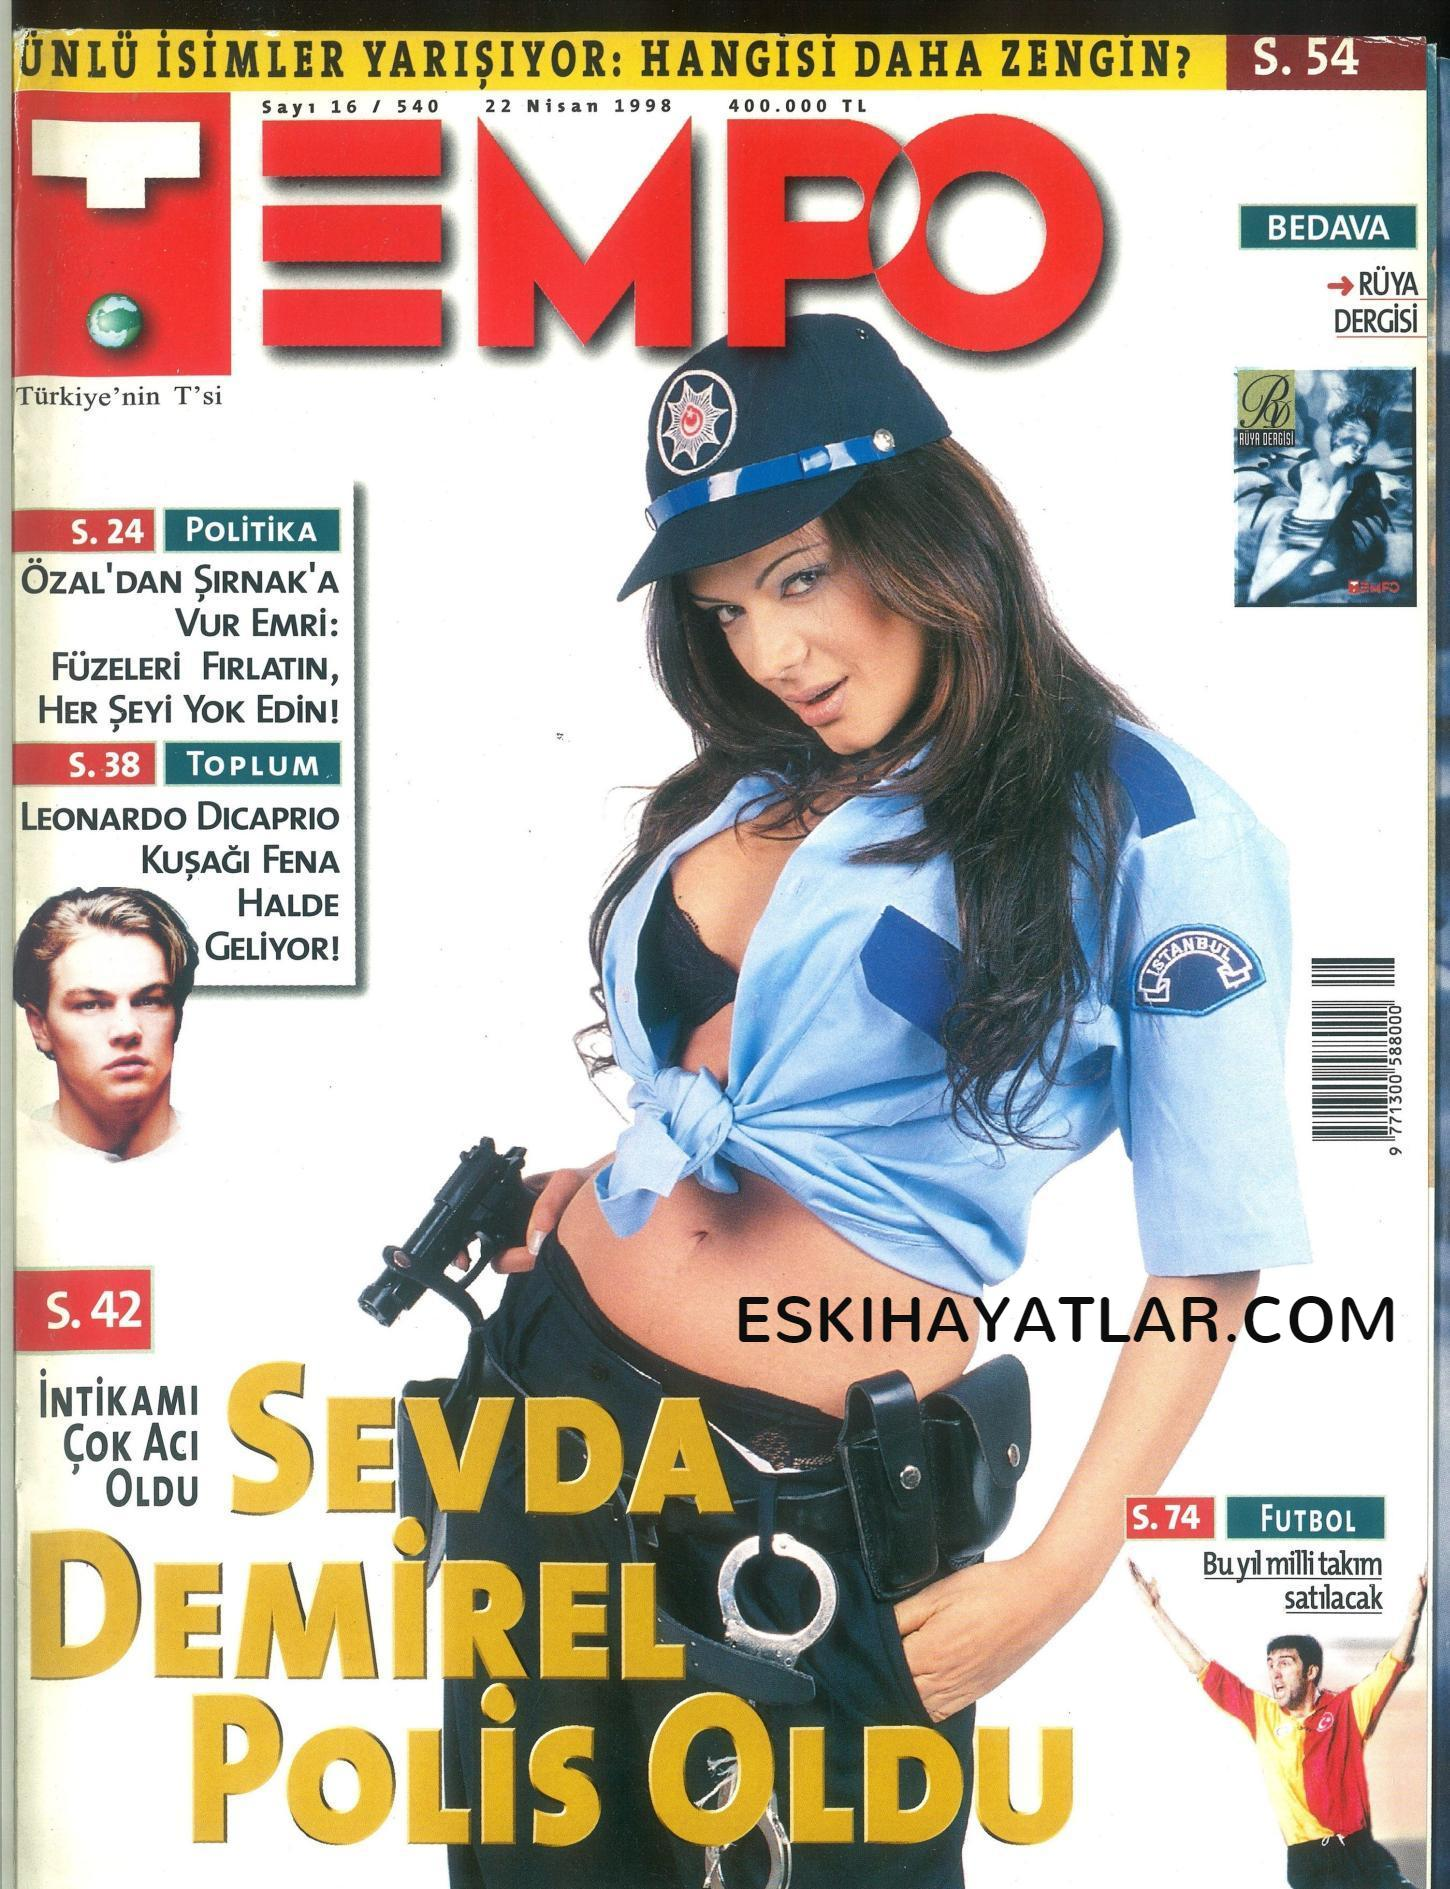 sevda-demirel-filmleri-patlayan-silikonlari-1998-tempo-dergisi (1)